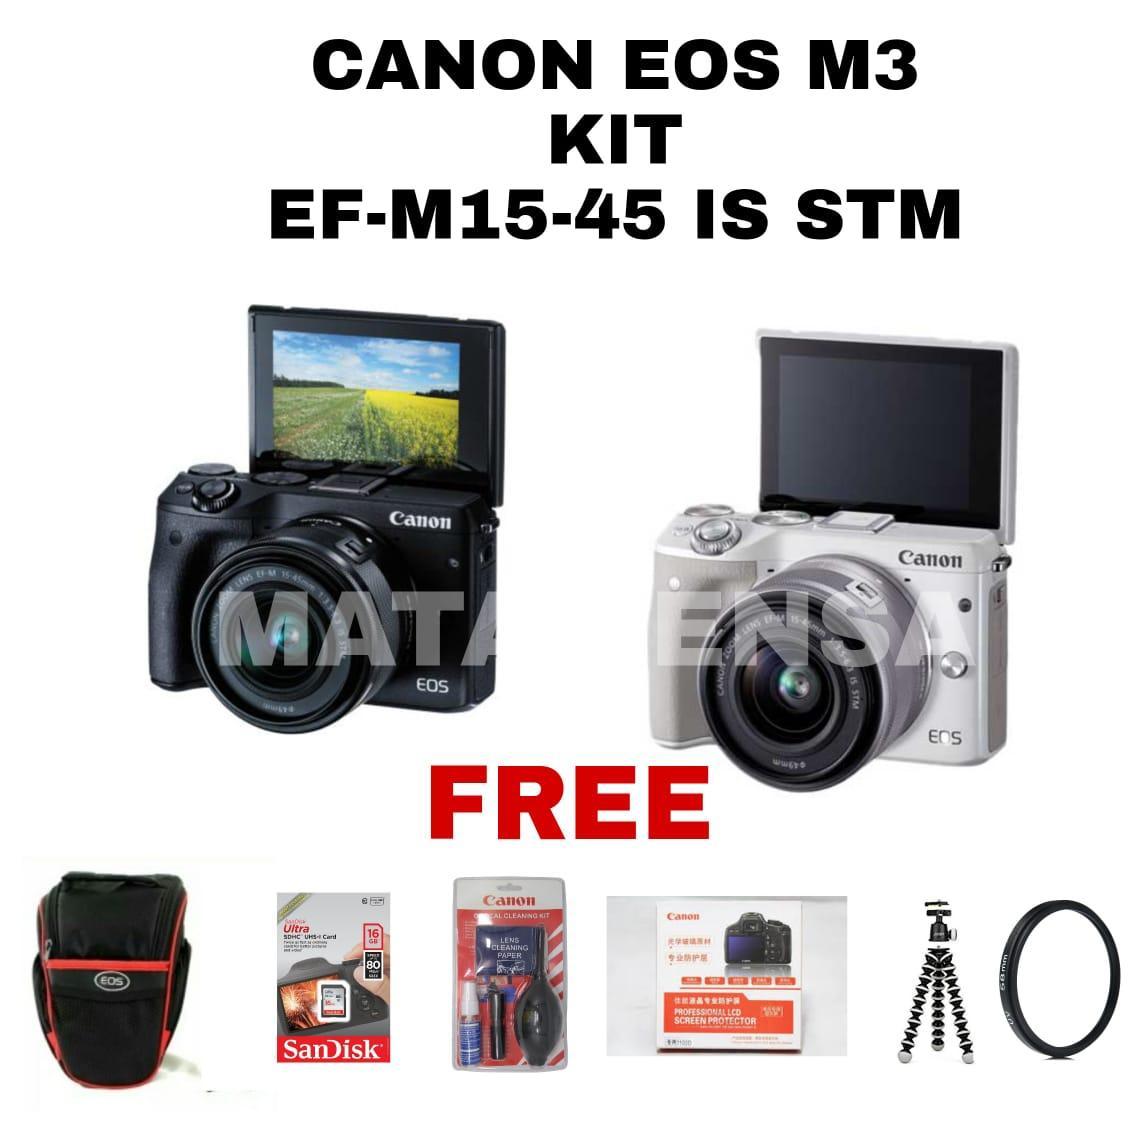 Kelebihan Canon Eos M3 Kit 15 45 Mm Stm Terkini Daftar Harga Dan M10 45mm Is 18 Mp Hitam Promo Paket Lengkap Camera Kamera Lensa Ef M15